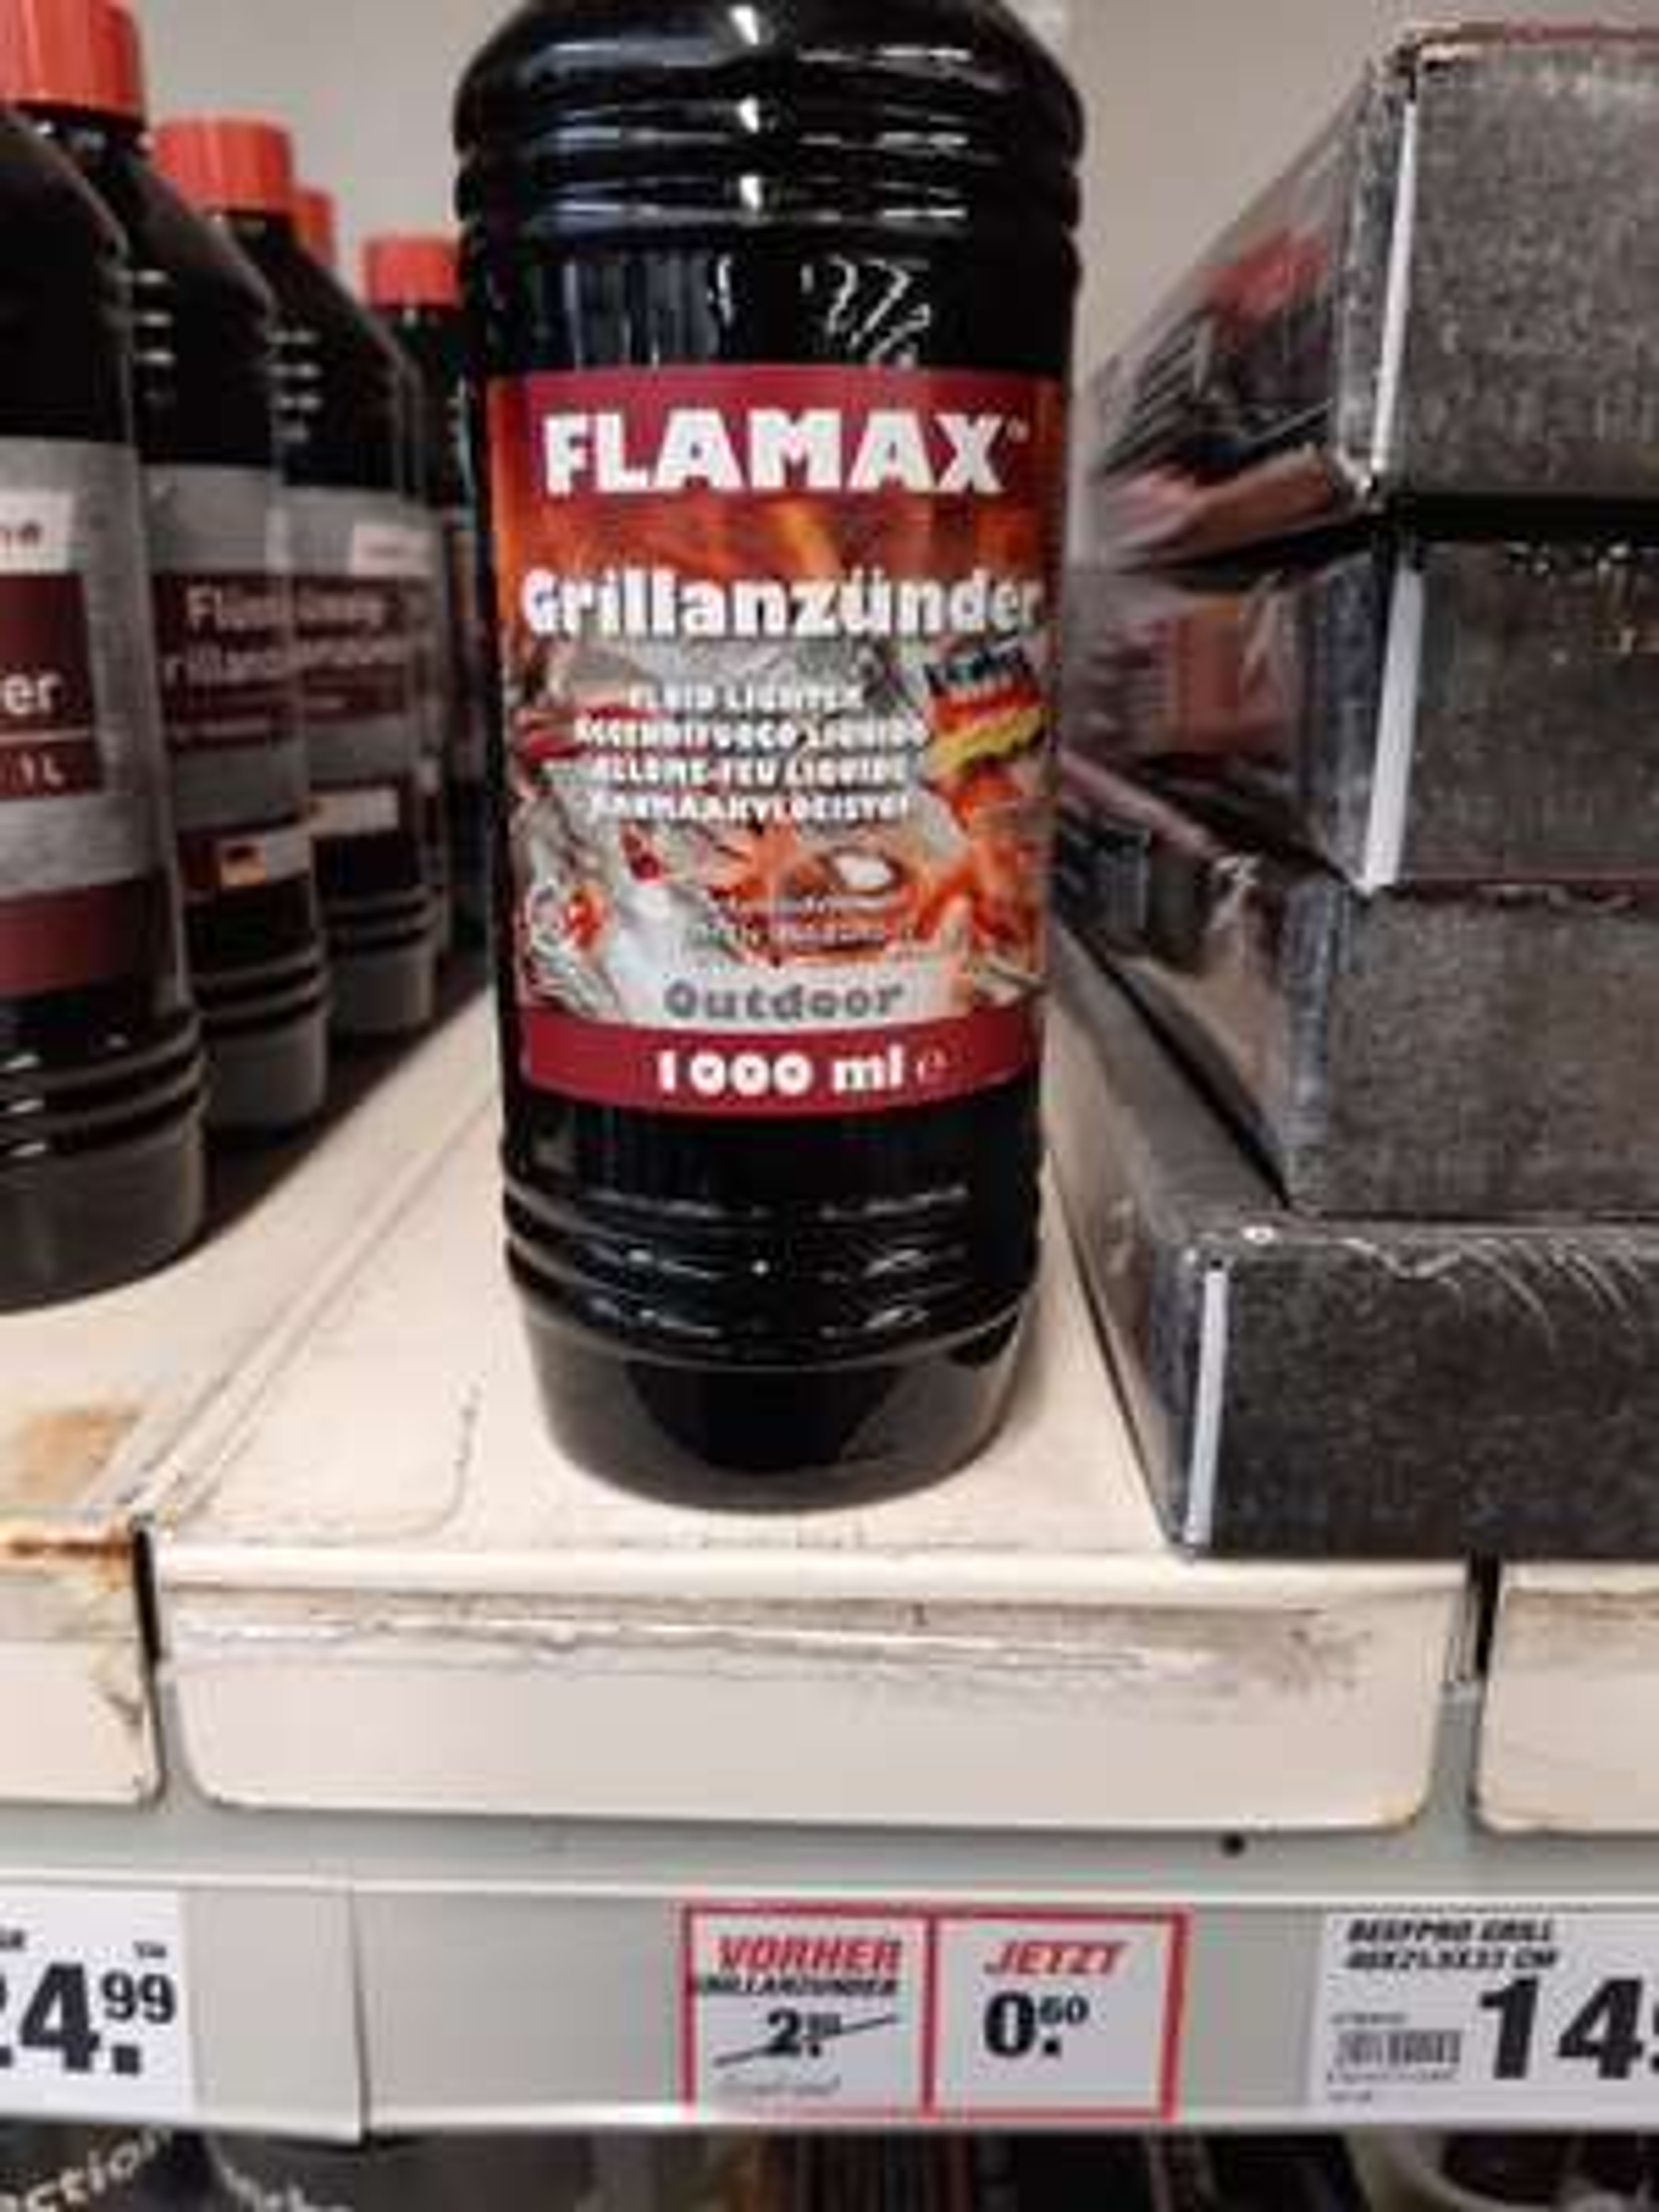 FLAMAX Grillanzünder flüssig, (lokal toom Duisburg Reinhauen)